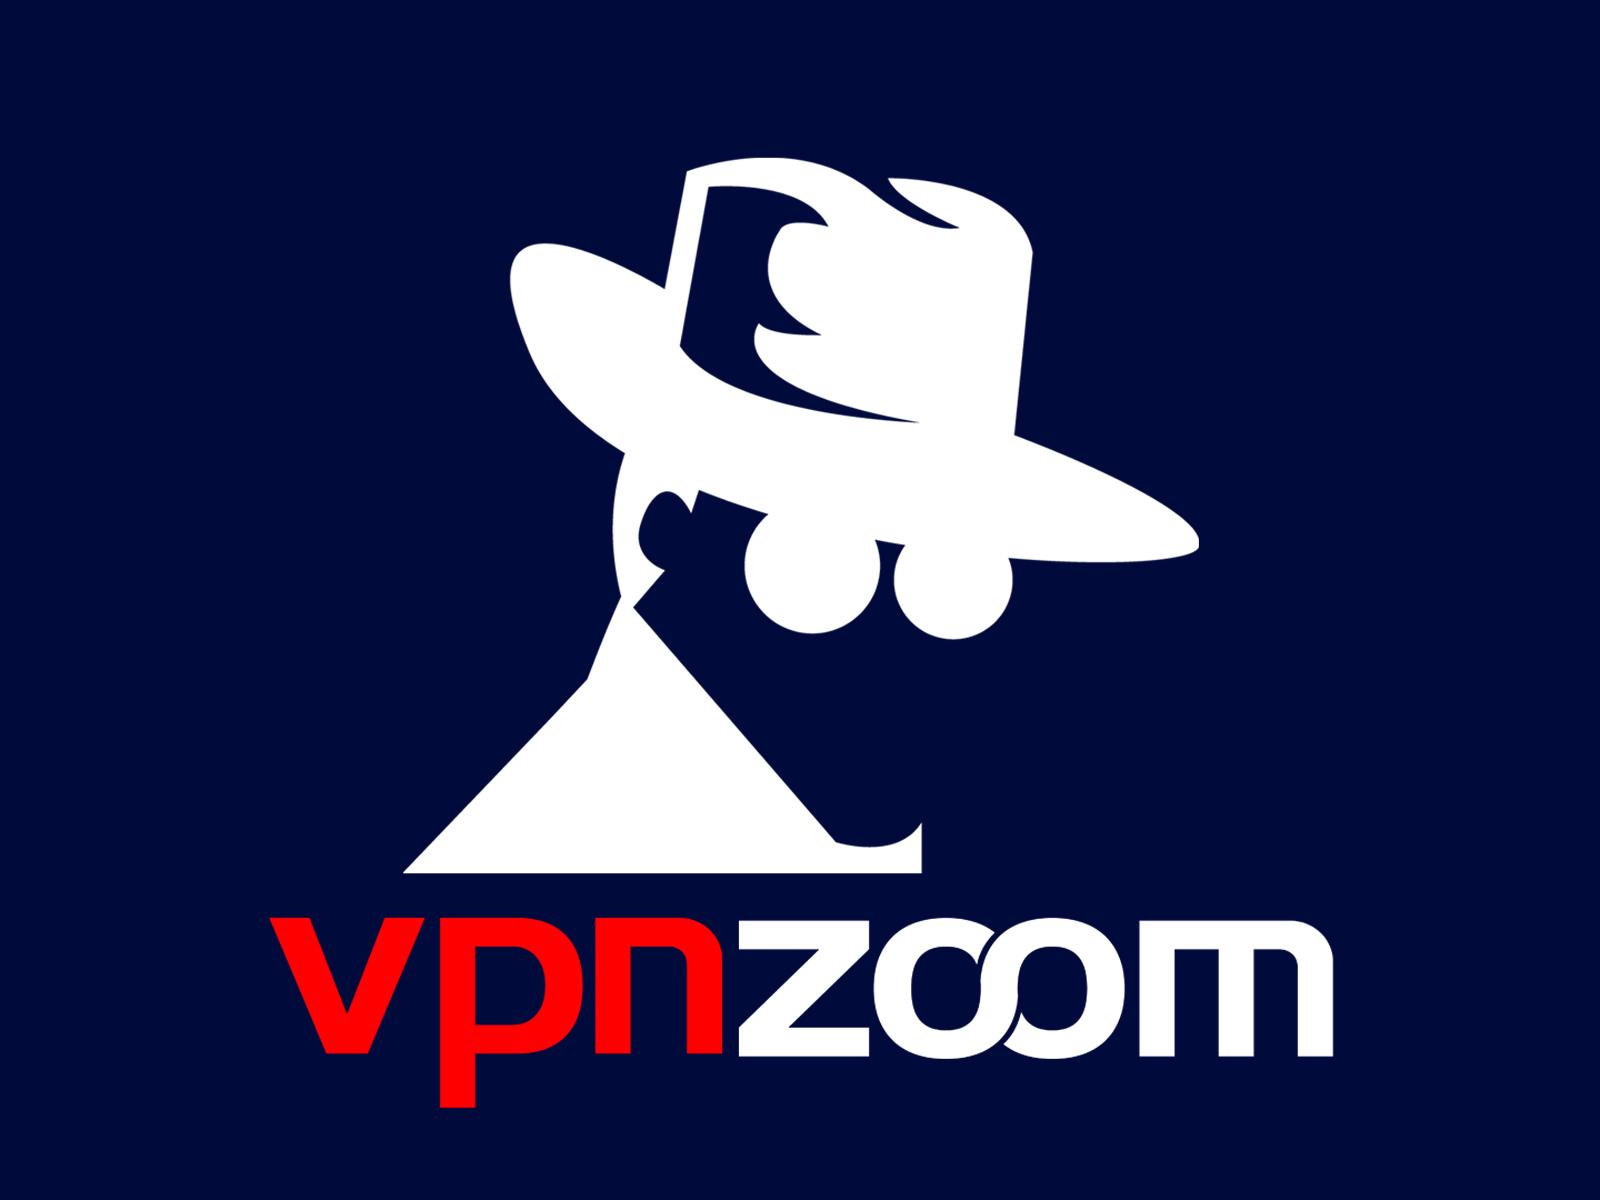 vpnzoom-v3-1600x1200